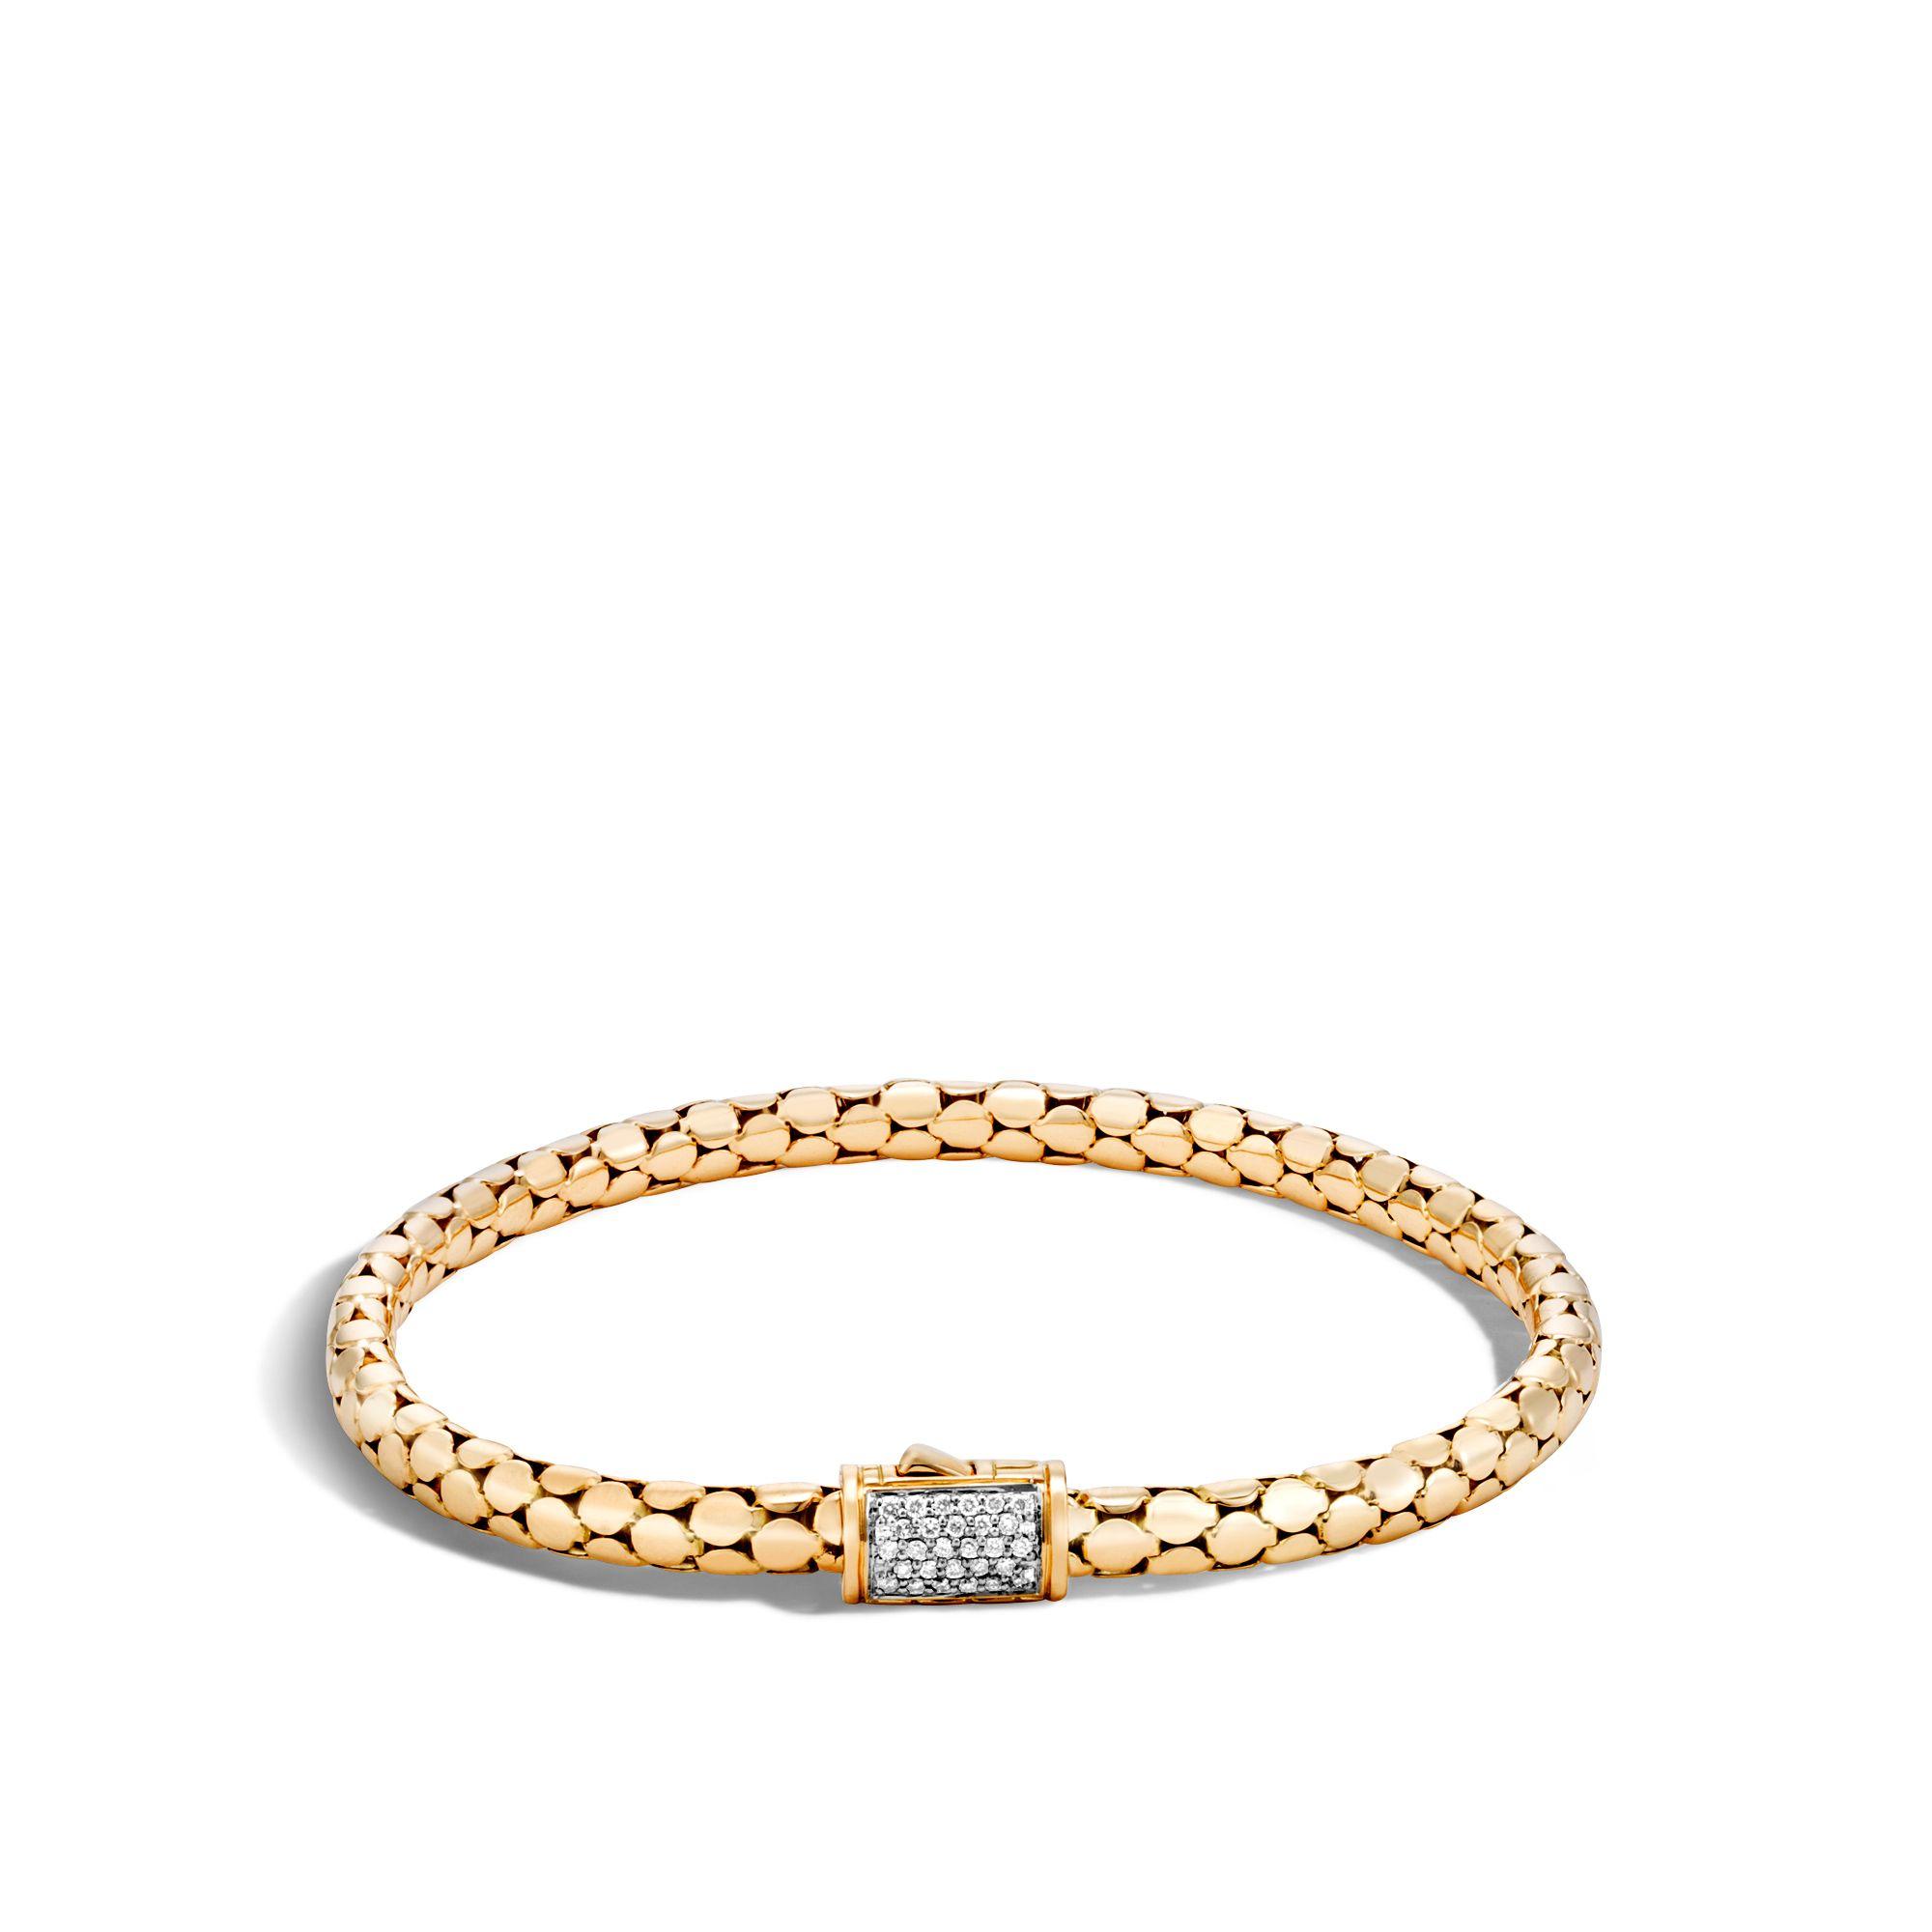 Dot slim chain bracelet johnhardy myjohnhardy miscellaneous